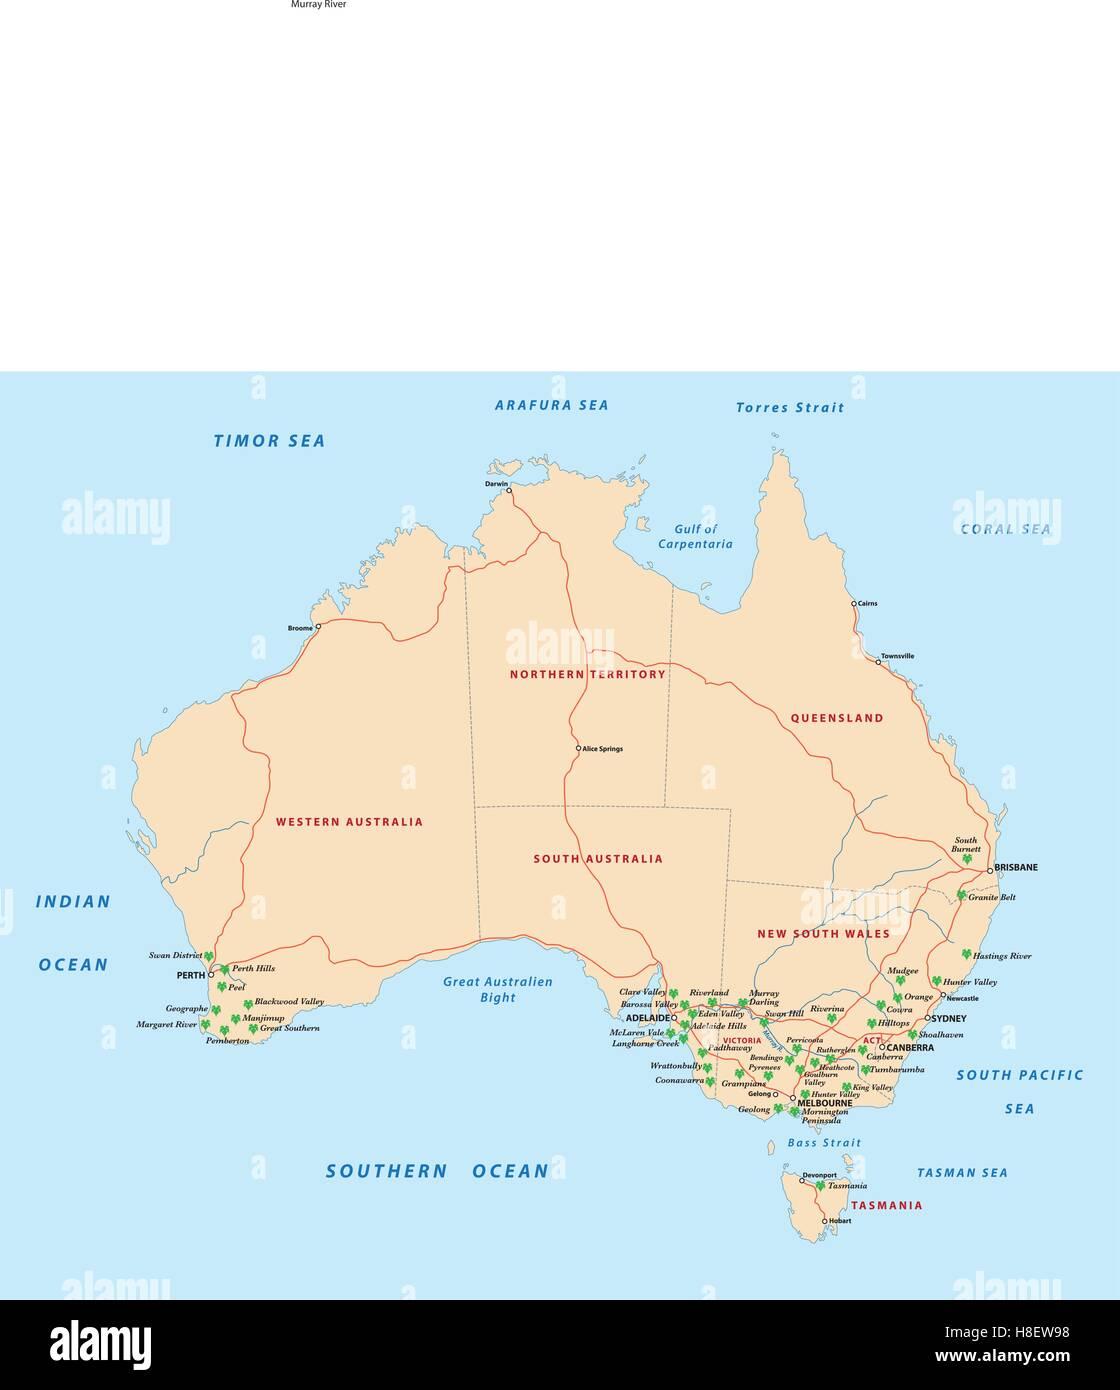 Australia Map Regions.Wine Producing Regions In Australia Map Stock Vector Art